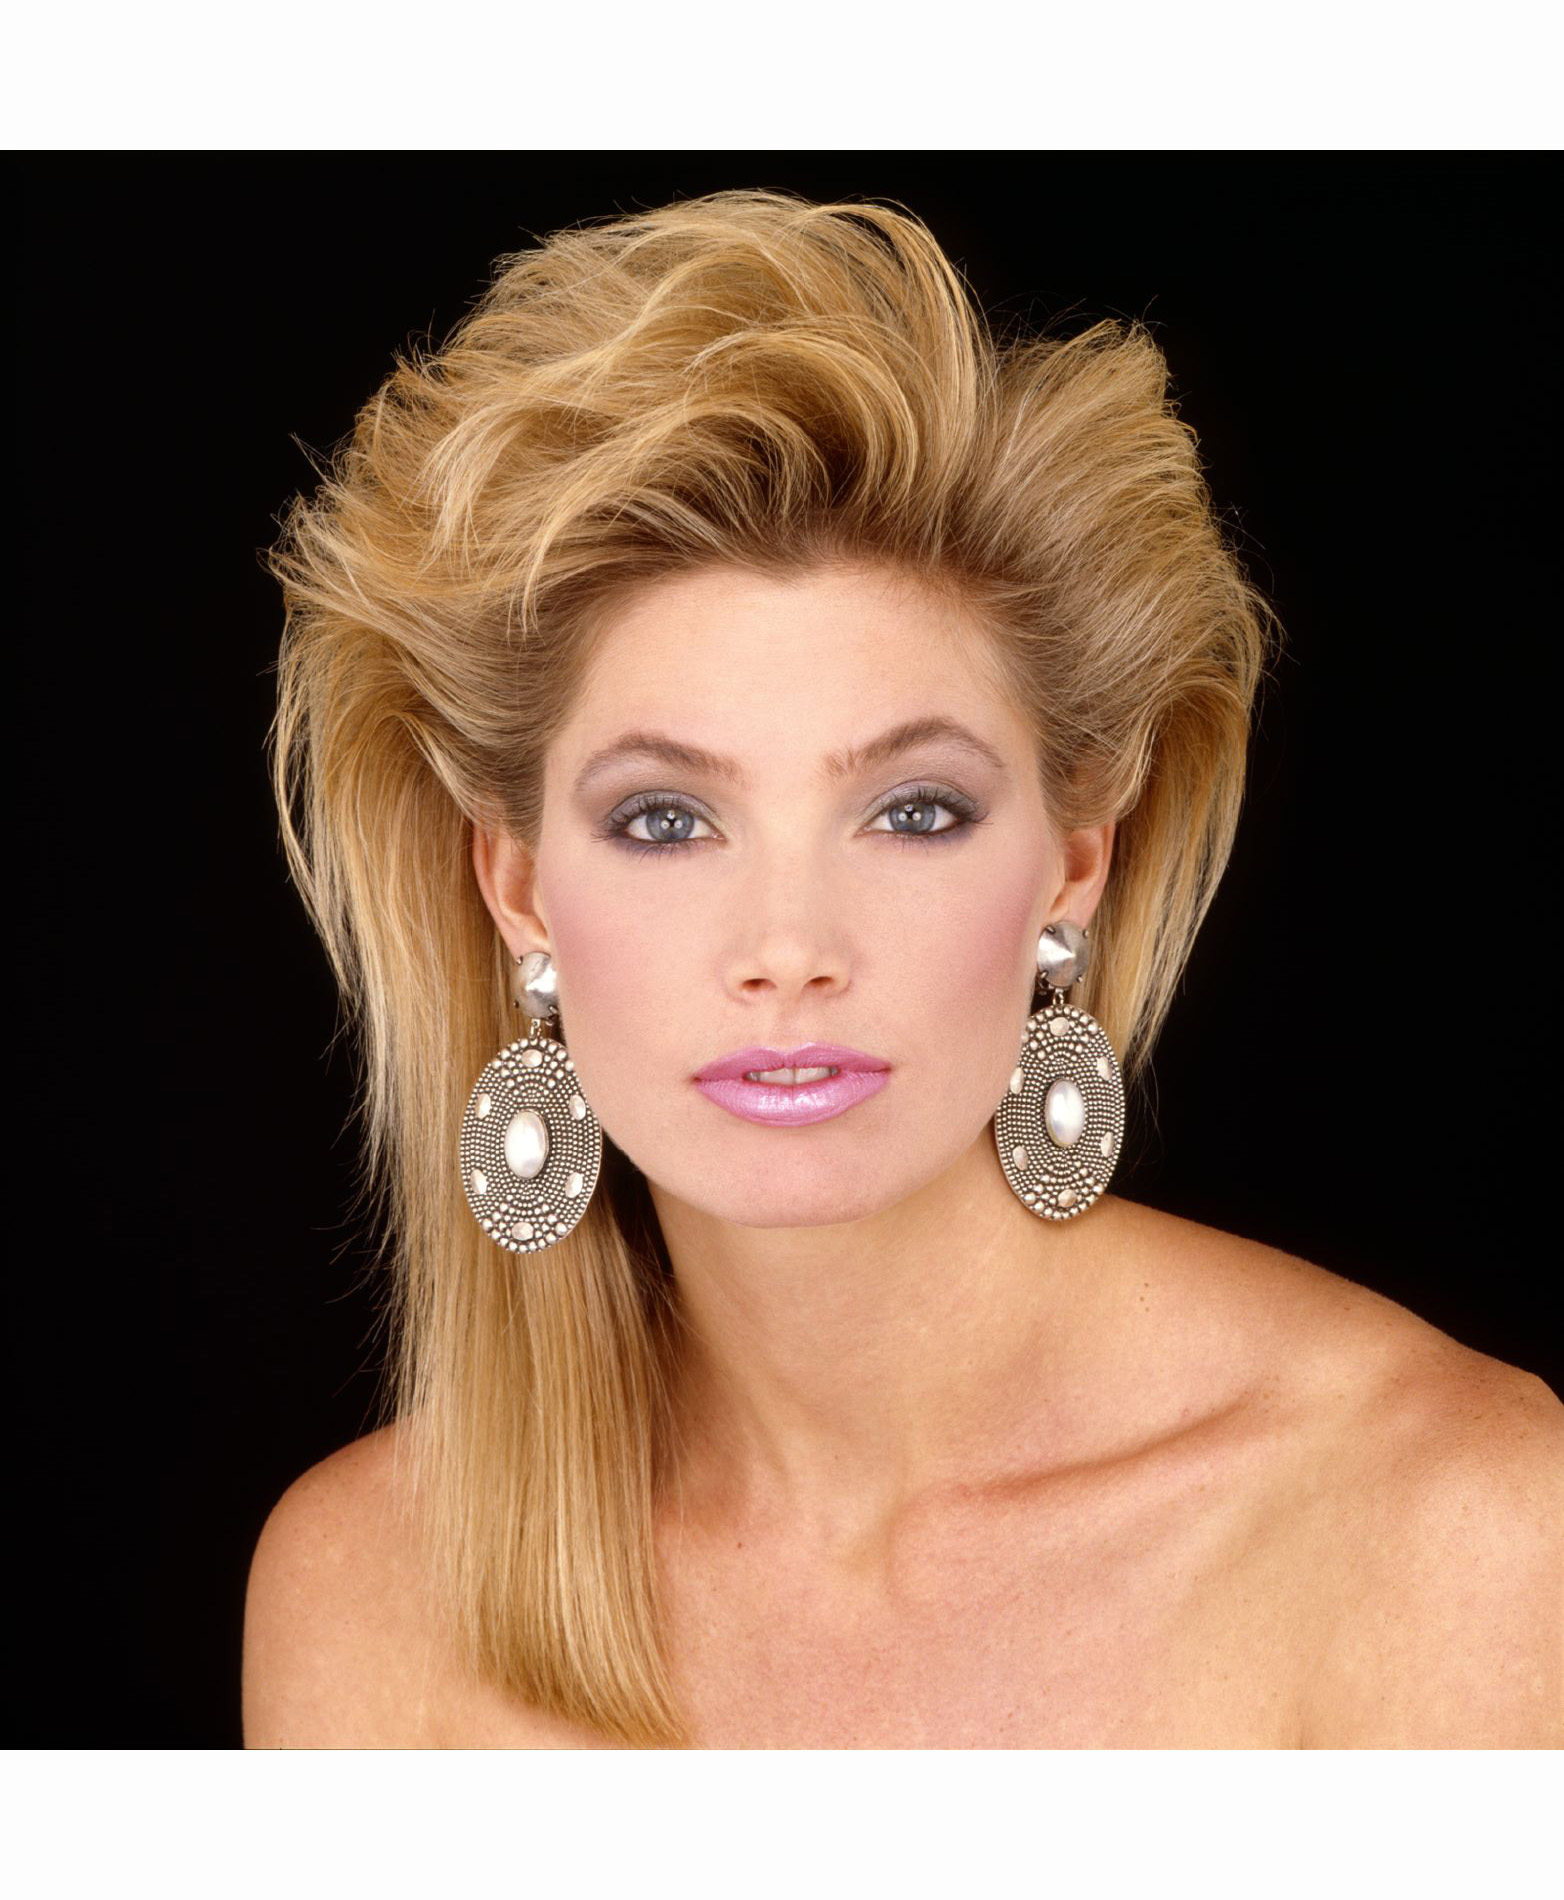 Zia Quizon (b. 1991),Joan Kemp-Welch Hot pics Ellen Terry,Harley Quinn Smith